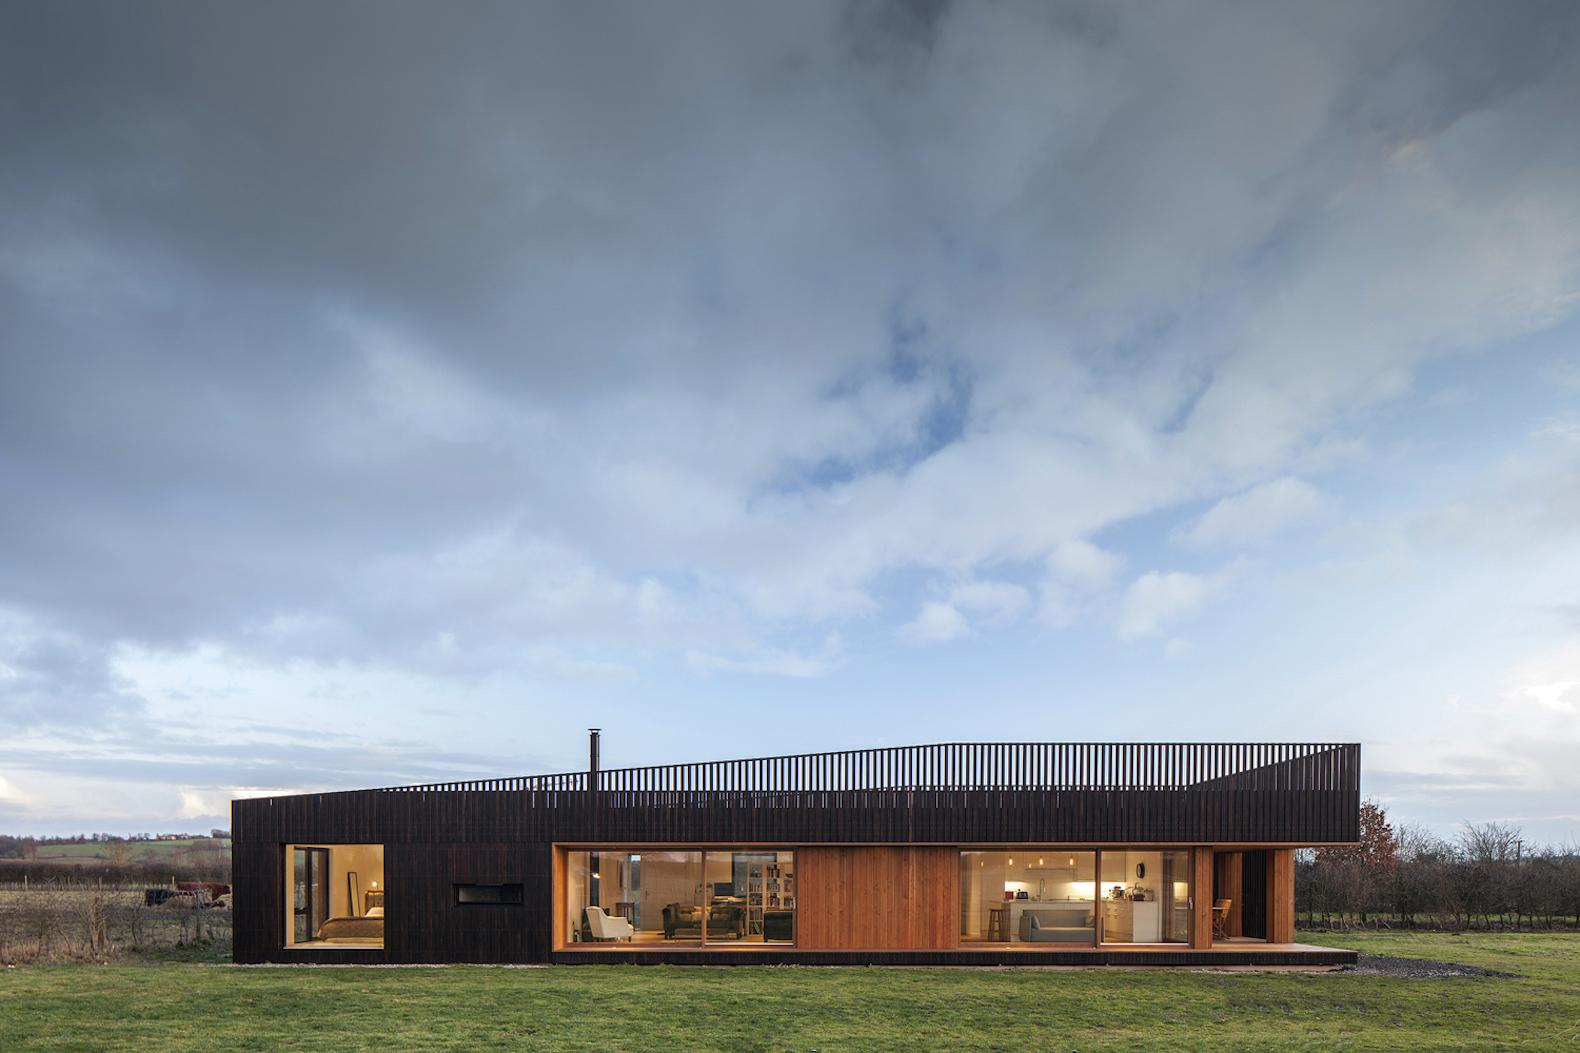 Howe-Farm-by-IPT-Architects-3.jpg